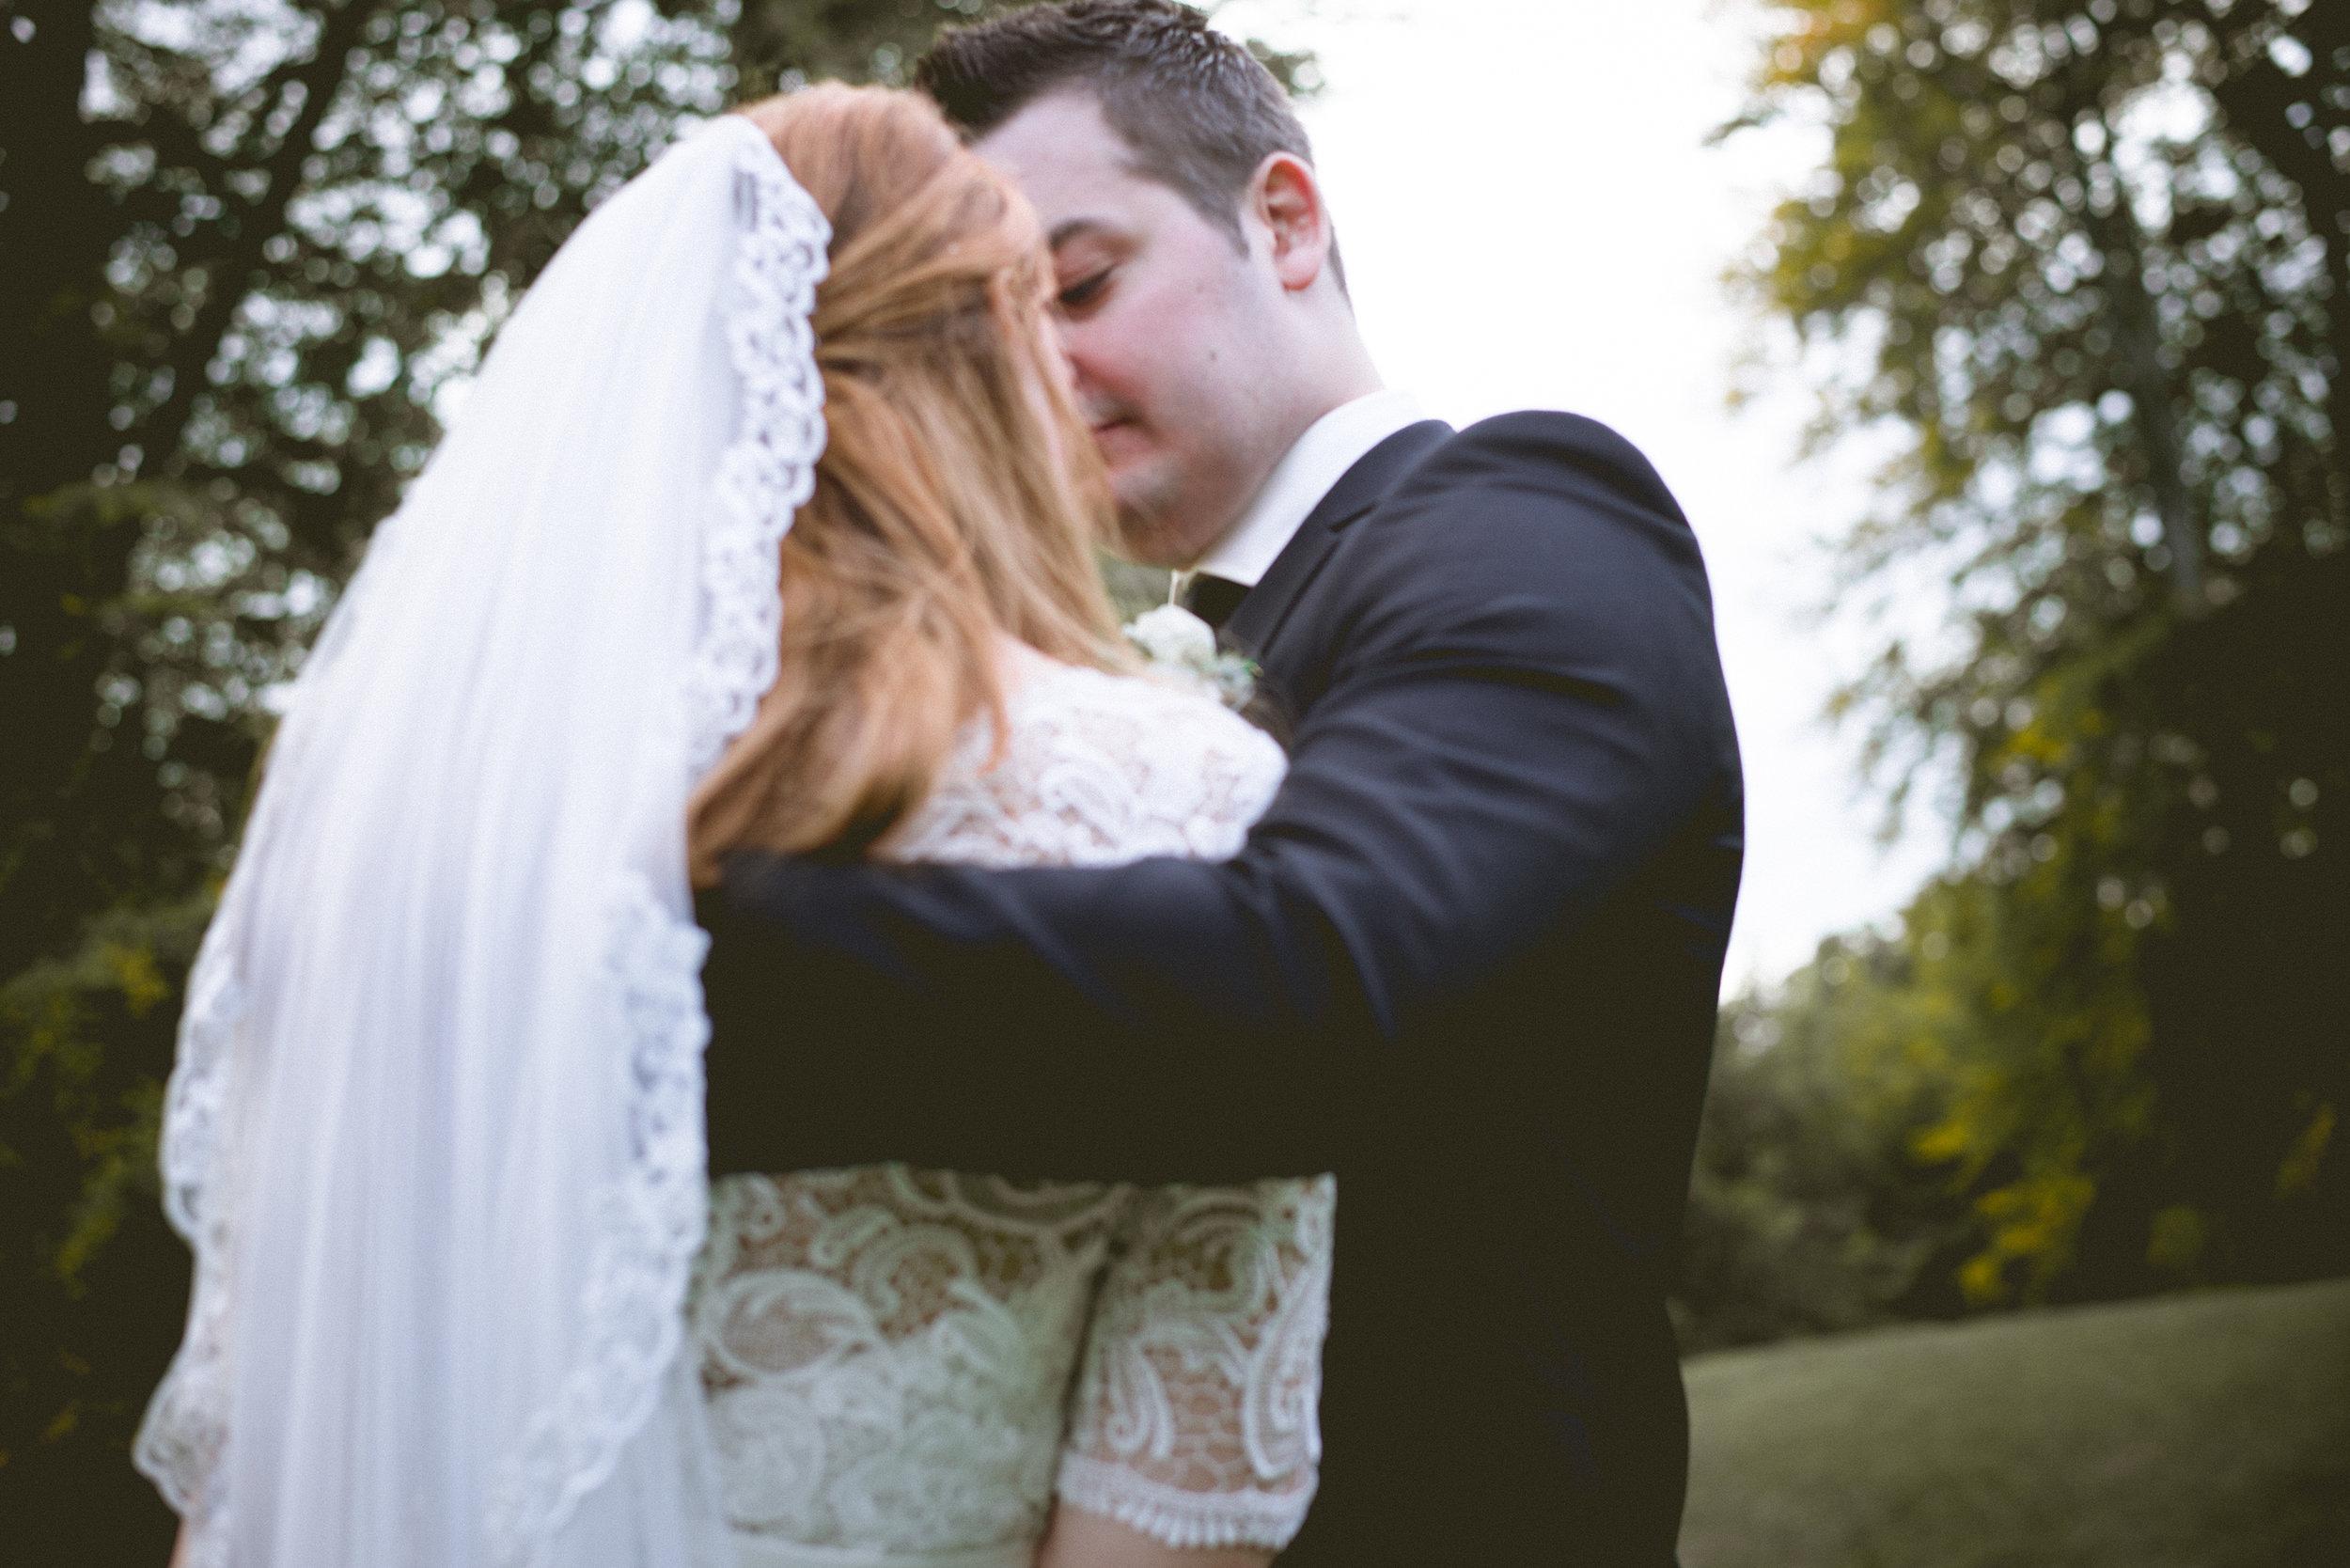 York Region Ontario Wedding Photographer - Bride + Groom-43.jpg